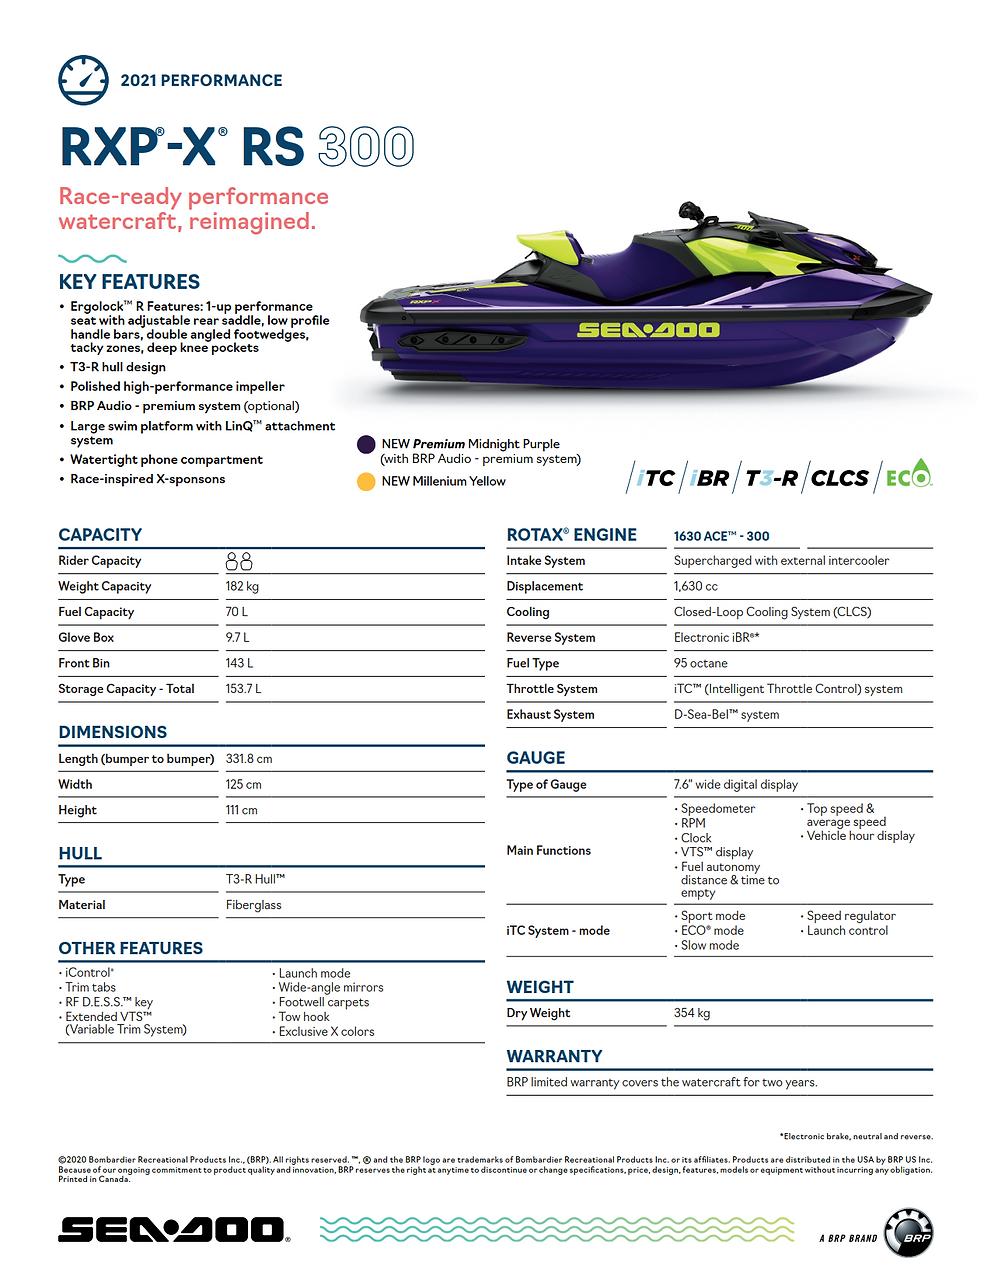 SeaDoo RXP RS 300.png